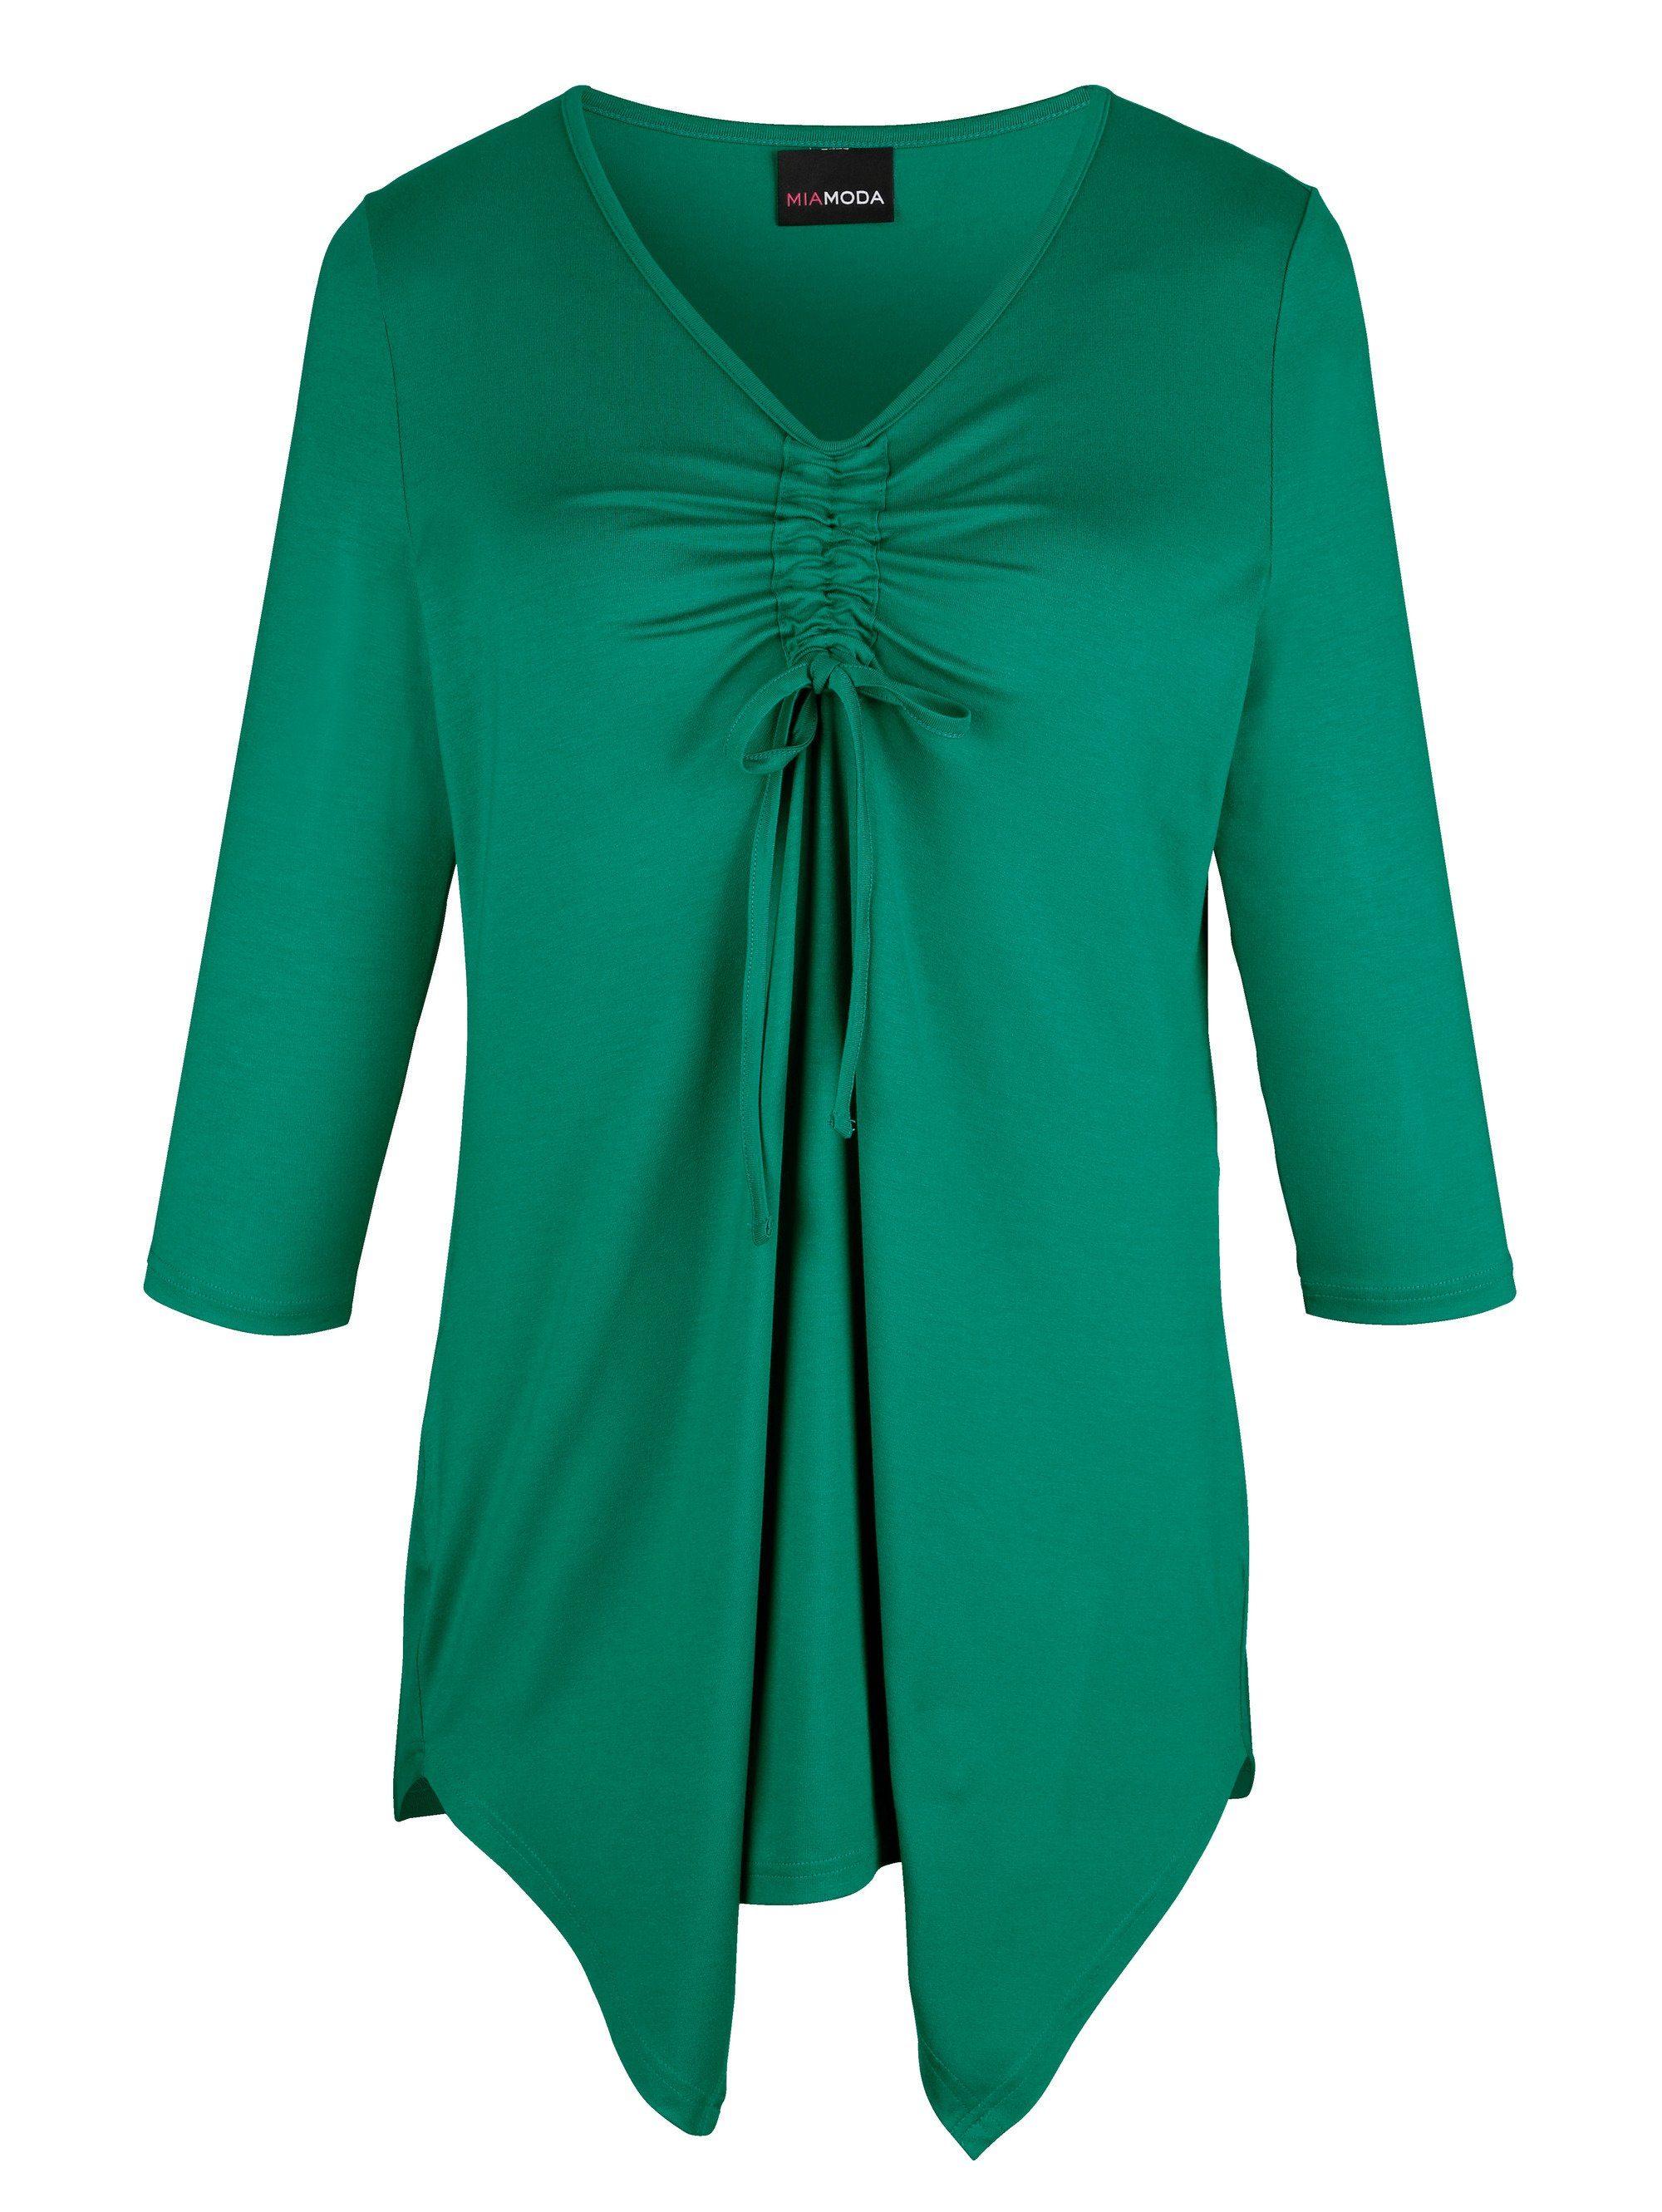 MIAMODA Zipfelshirt mit Raffung und Bindeband am Ausschnitt | Bekleidung > Shirts > Zipfelshirts | Miamoda